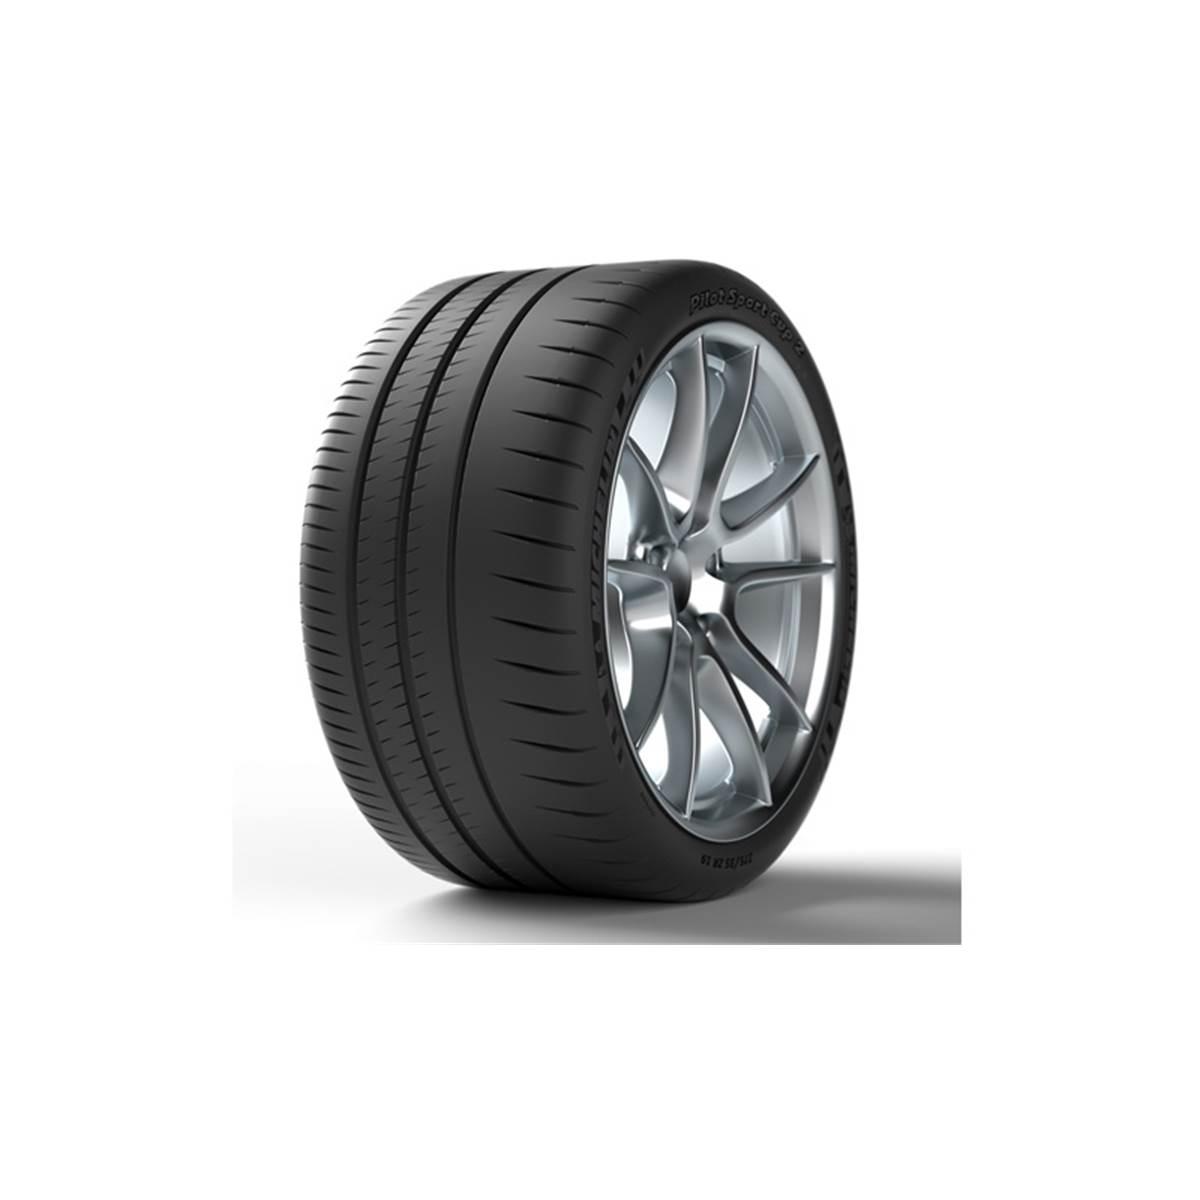 Pneu Michelin 245/35R19 93Y Pilot Sport Cup 2 XL